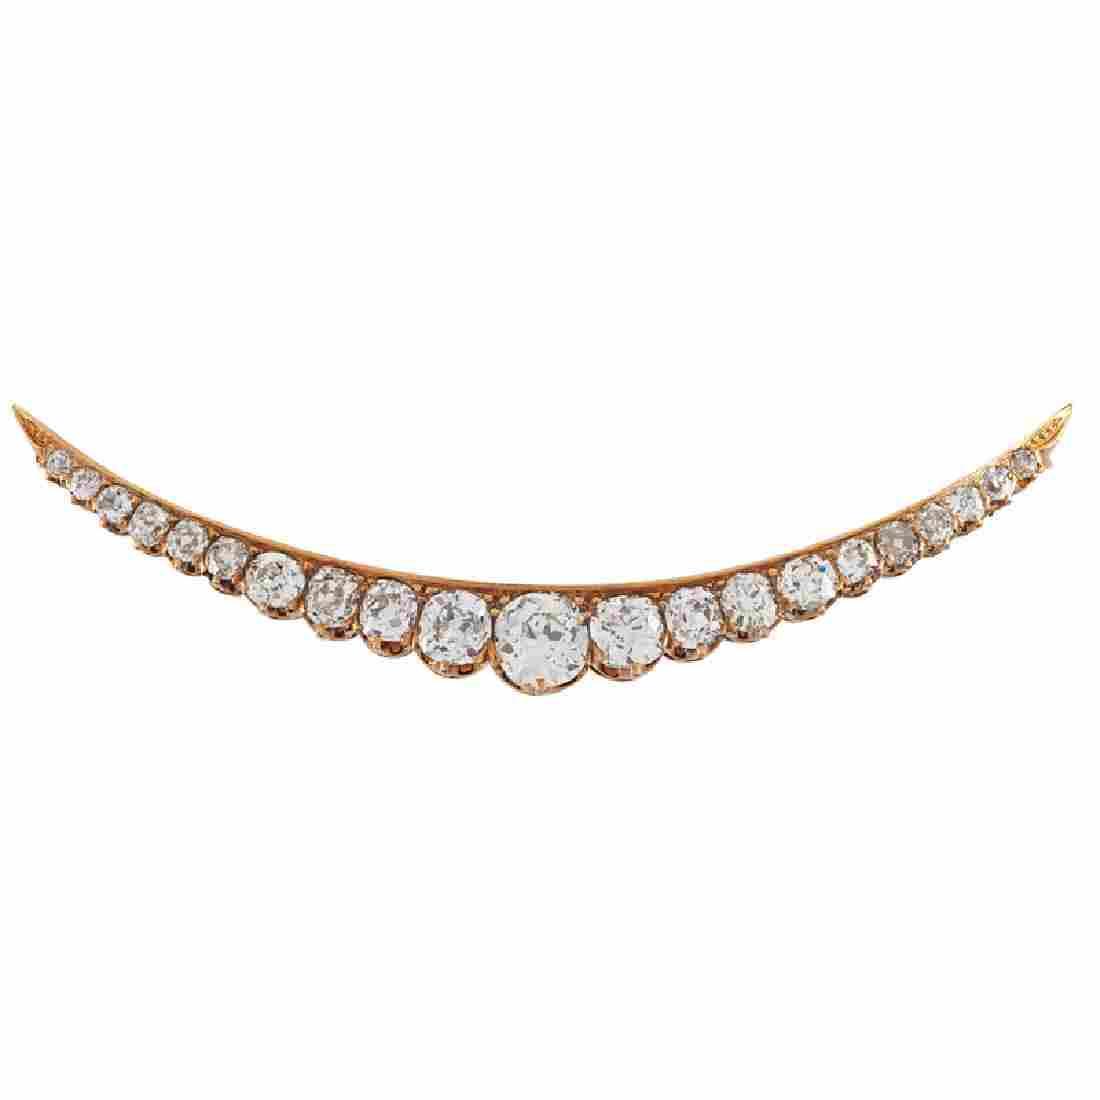 EDWARDIAN DIAMOND & YELLOW GOLD CRESCENT BROOCH